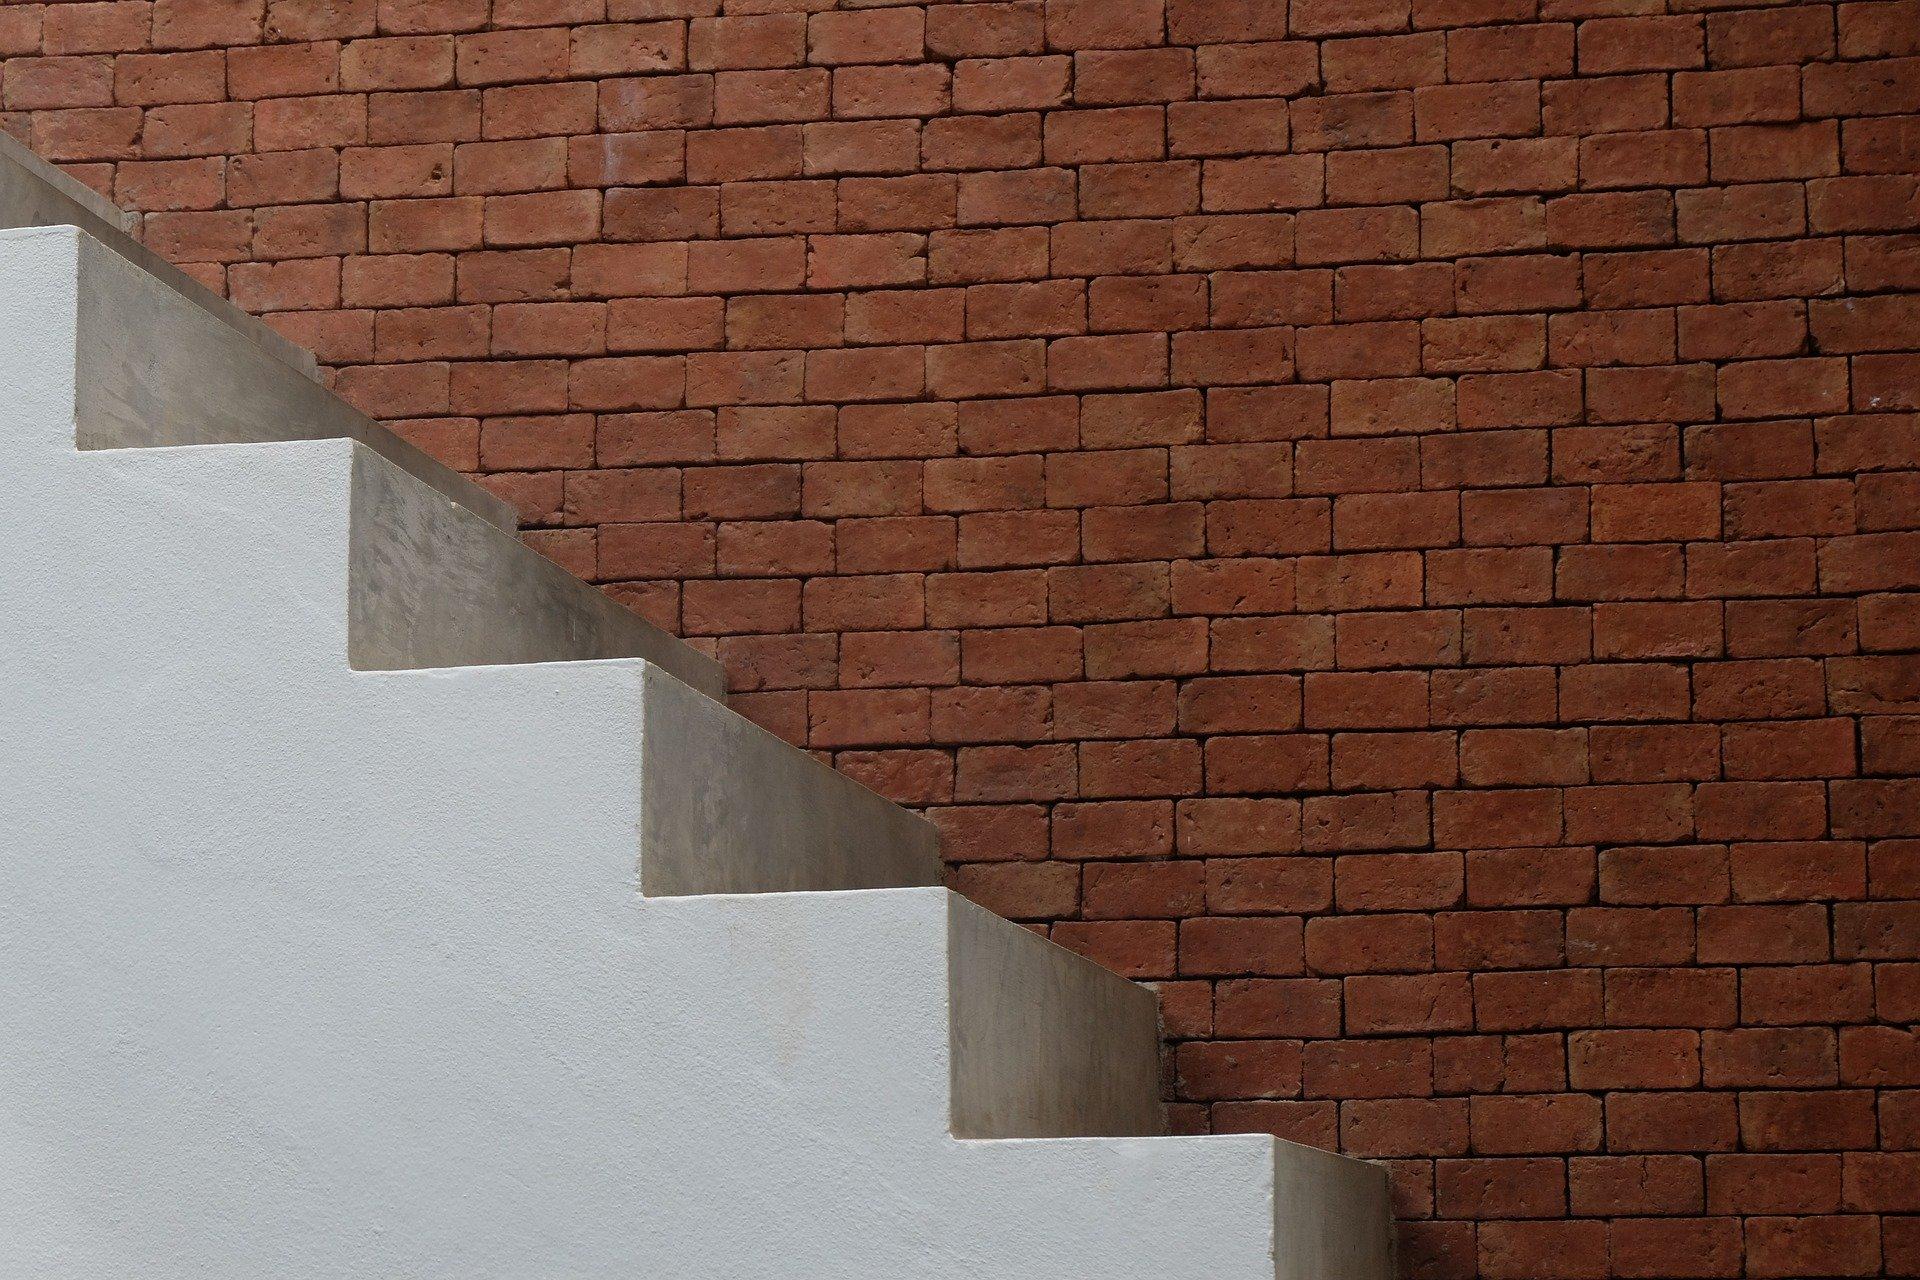 Treppe © Pixabay 2020 / Foto: ekk814